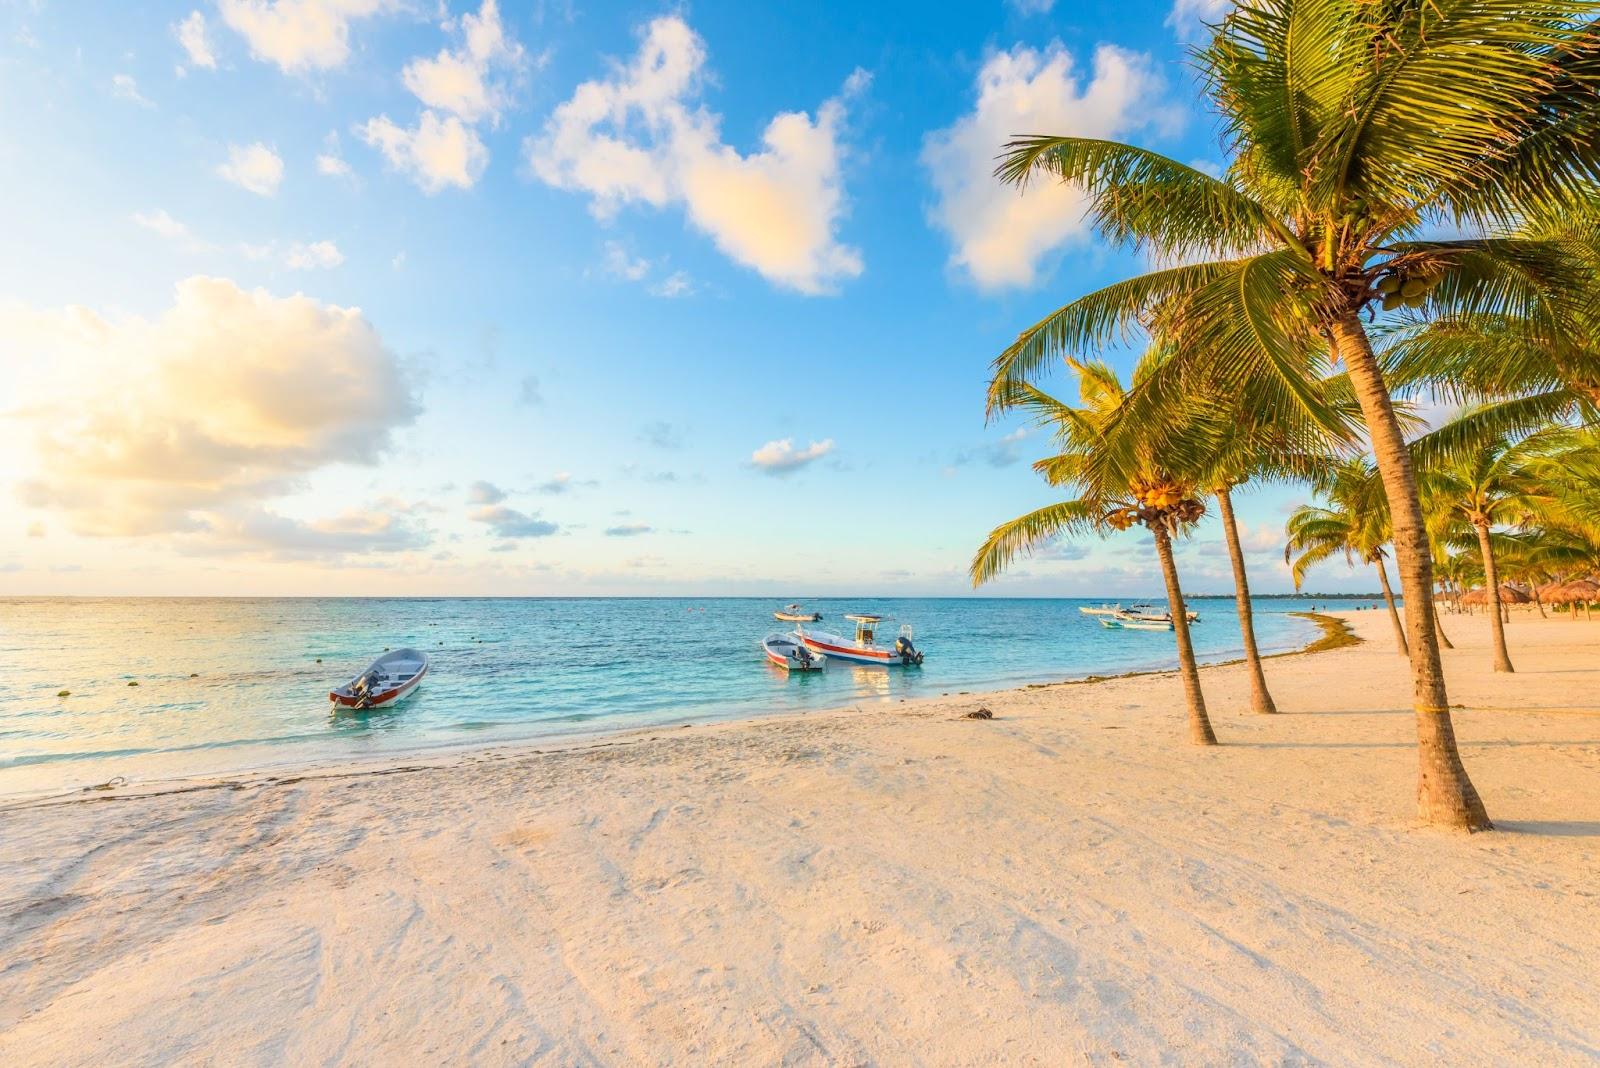 Riviera Maya for your best wedding destinations